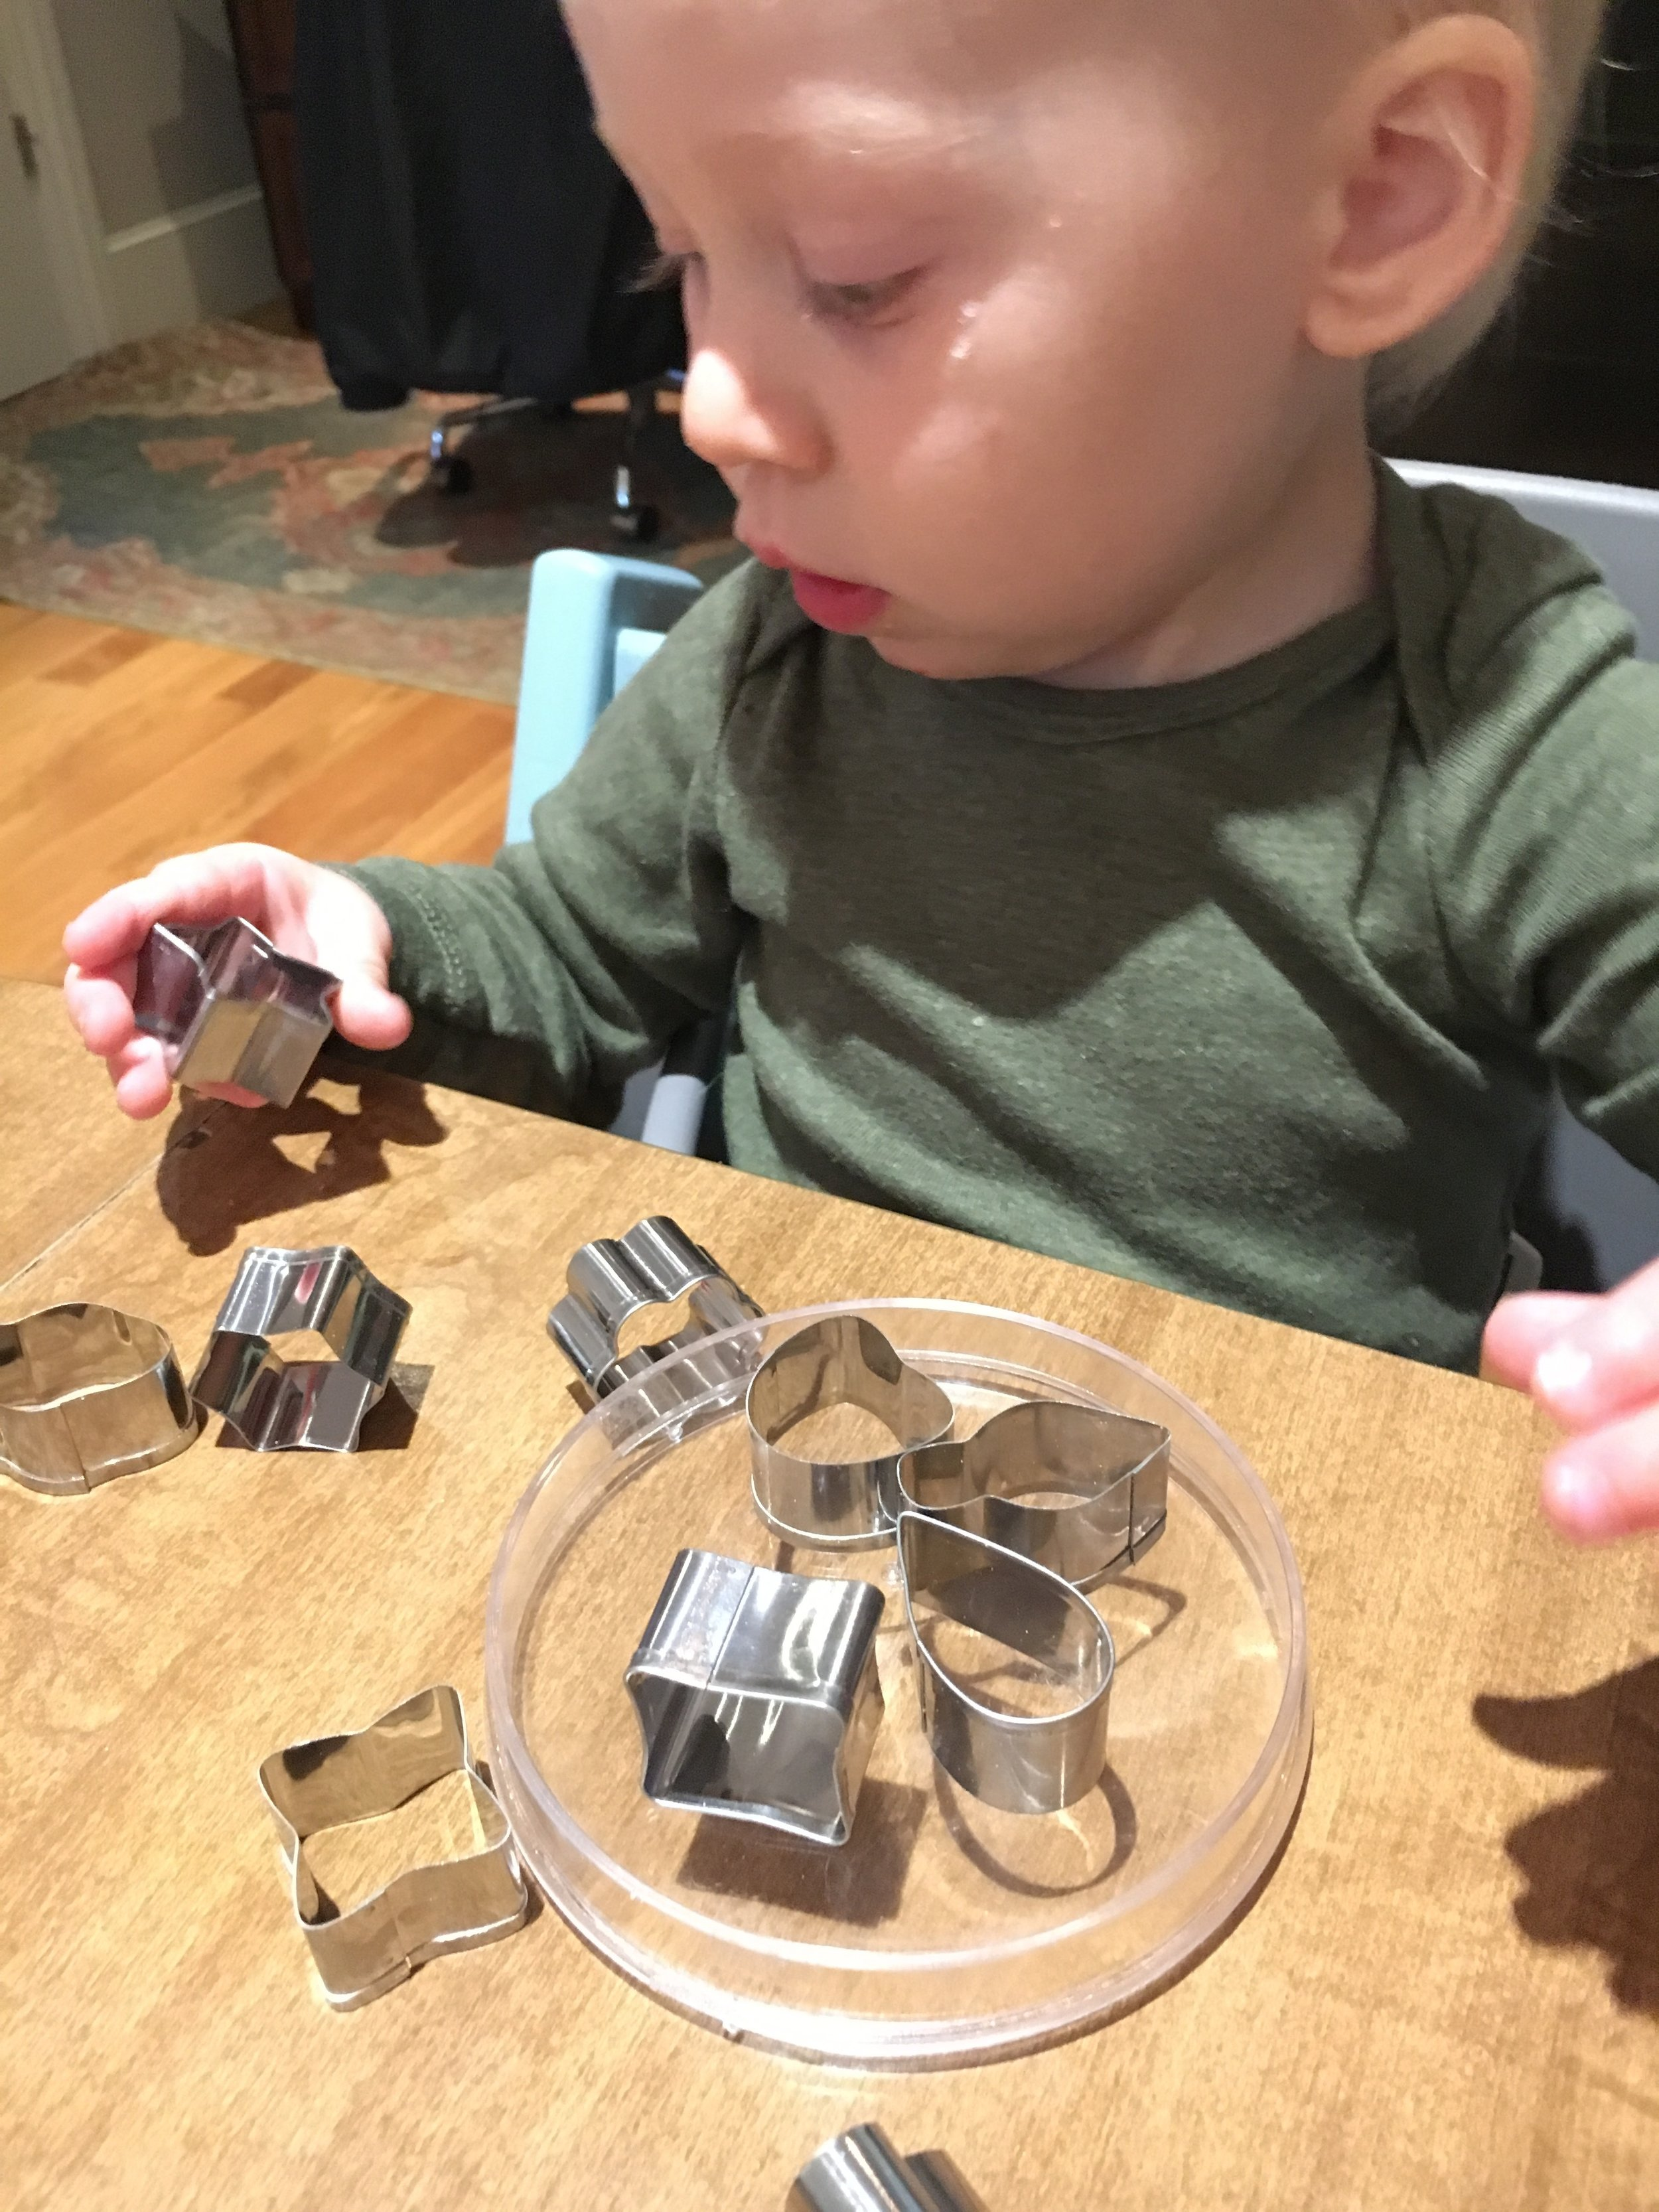 Choosing a cookie cutter is hard work!